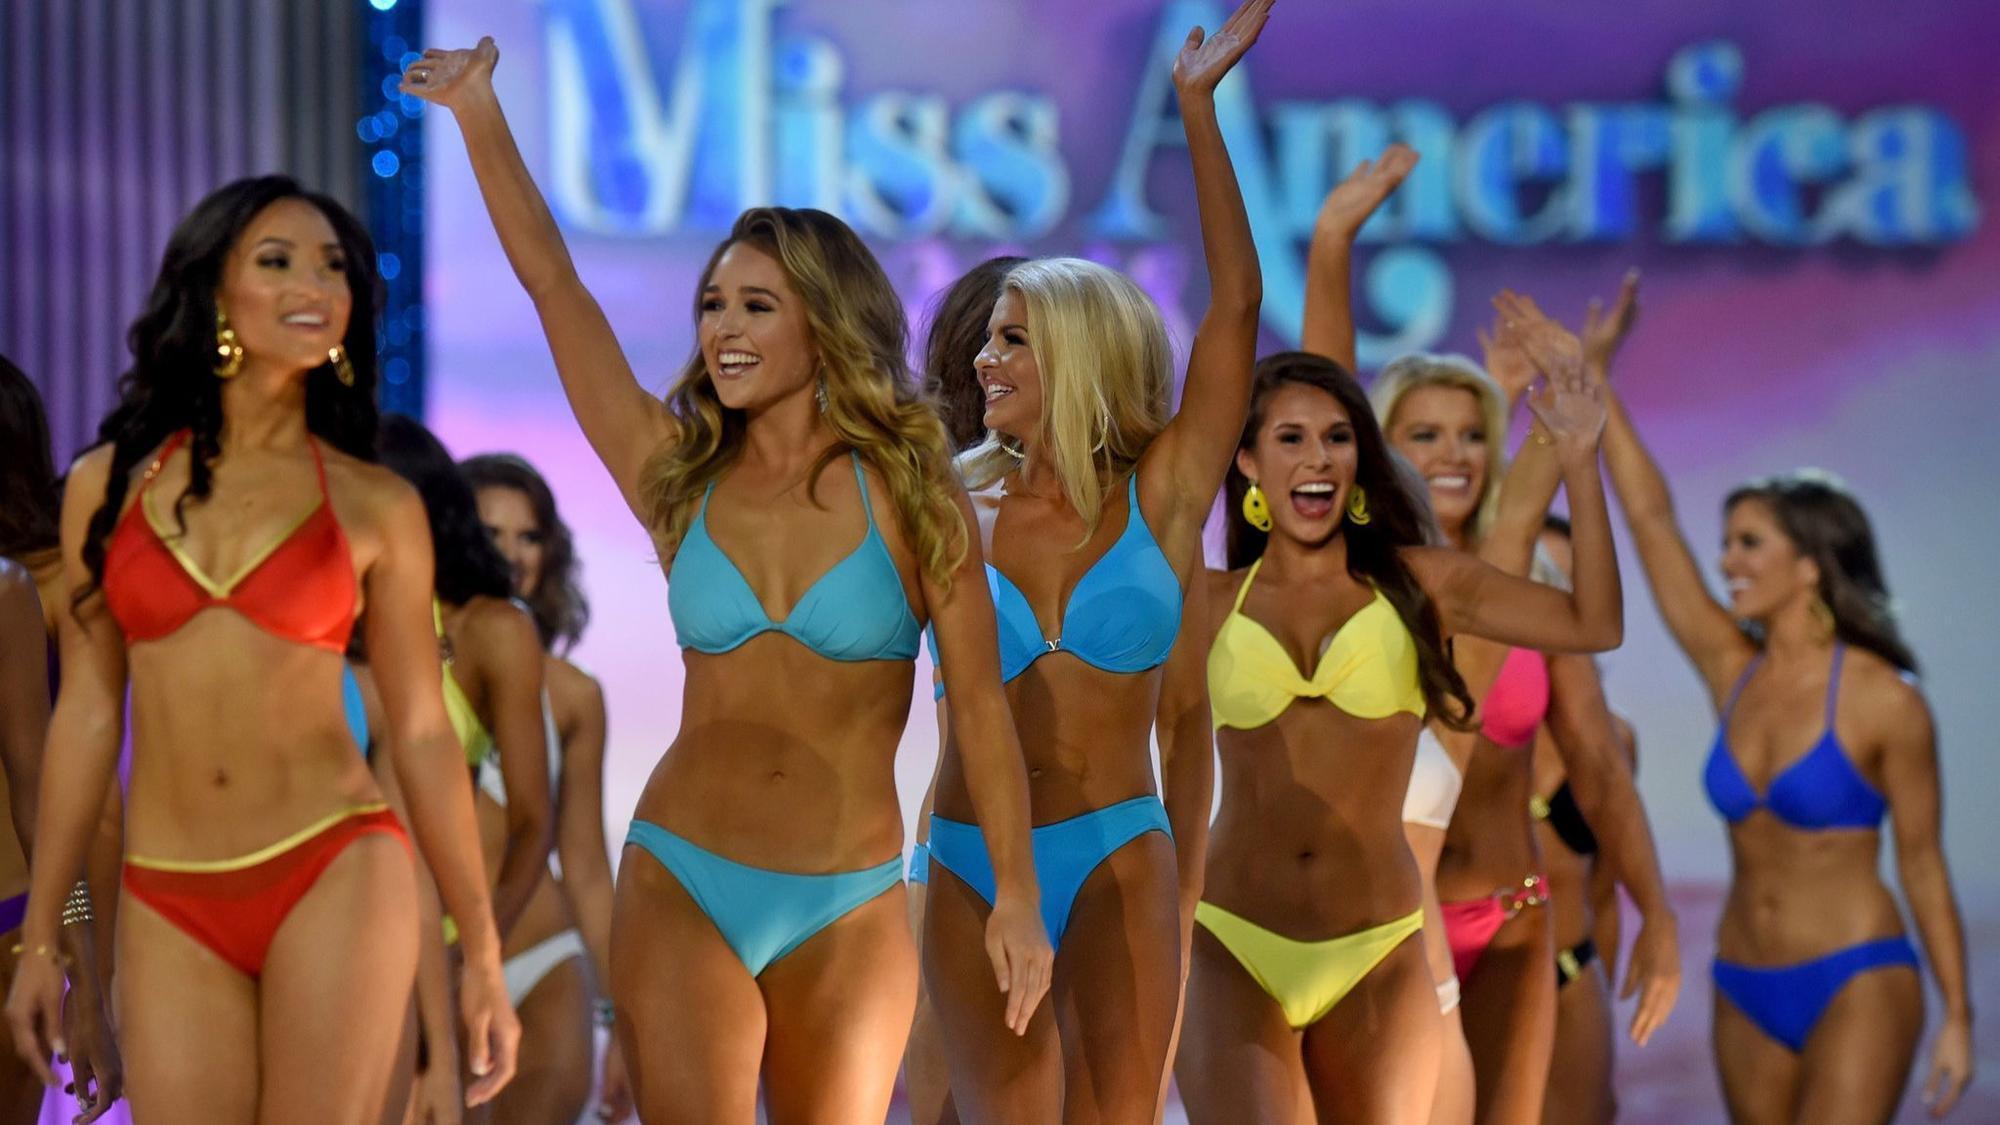 Mrs usa bikini video — photo 5